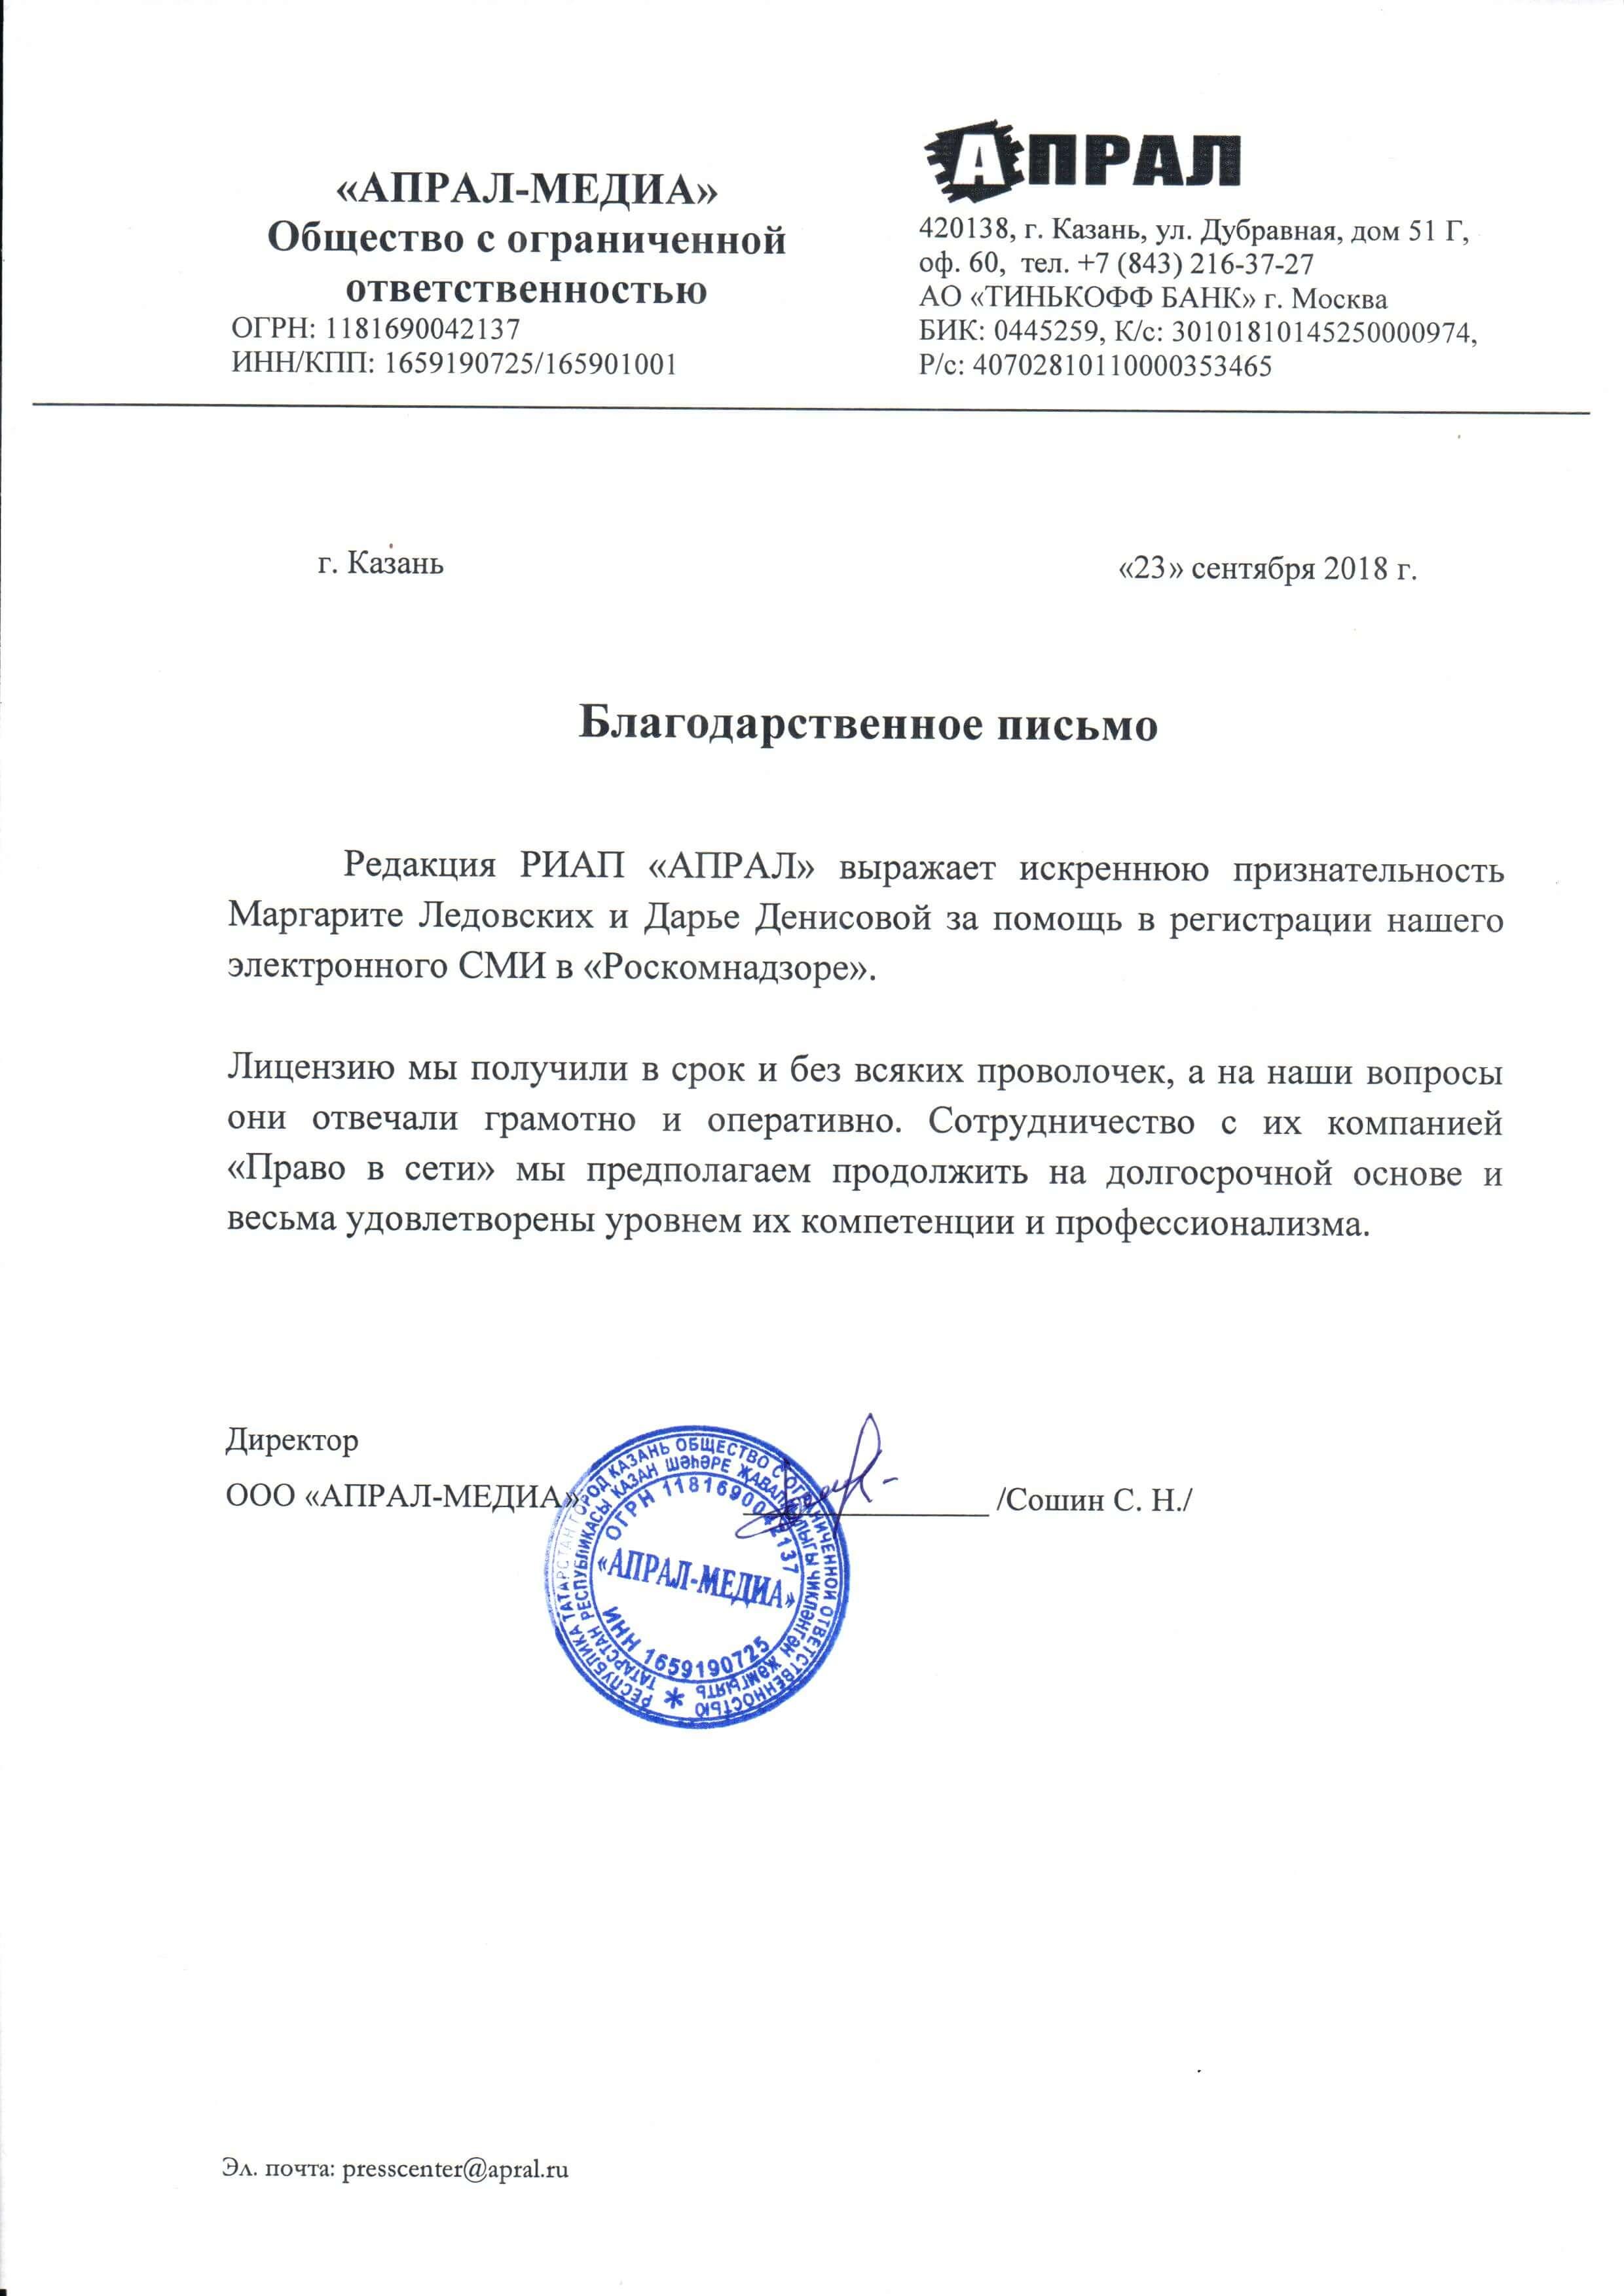 регистрация СМИ Апрал-медиа